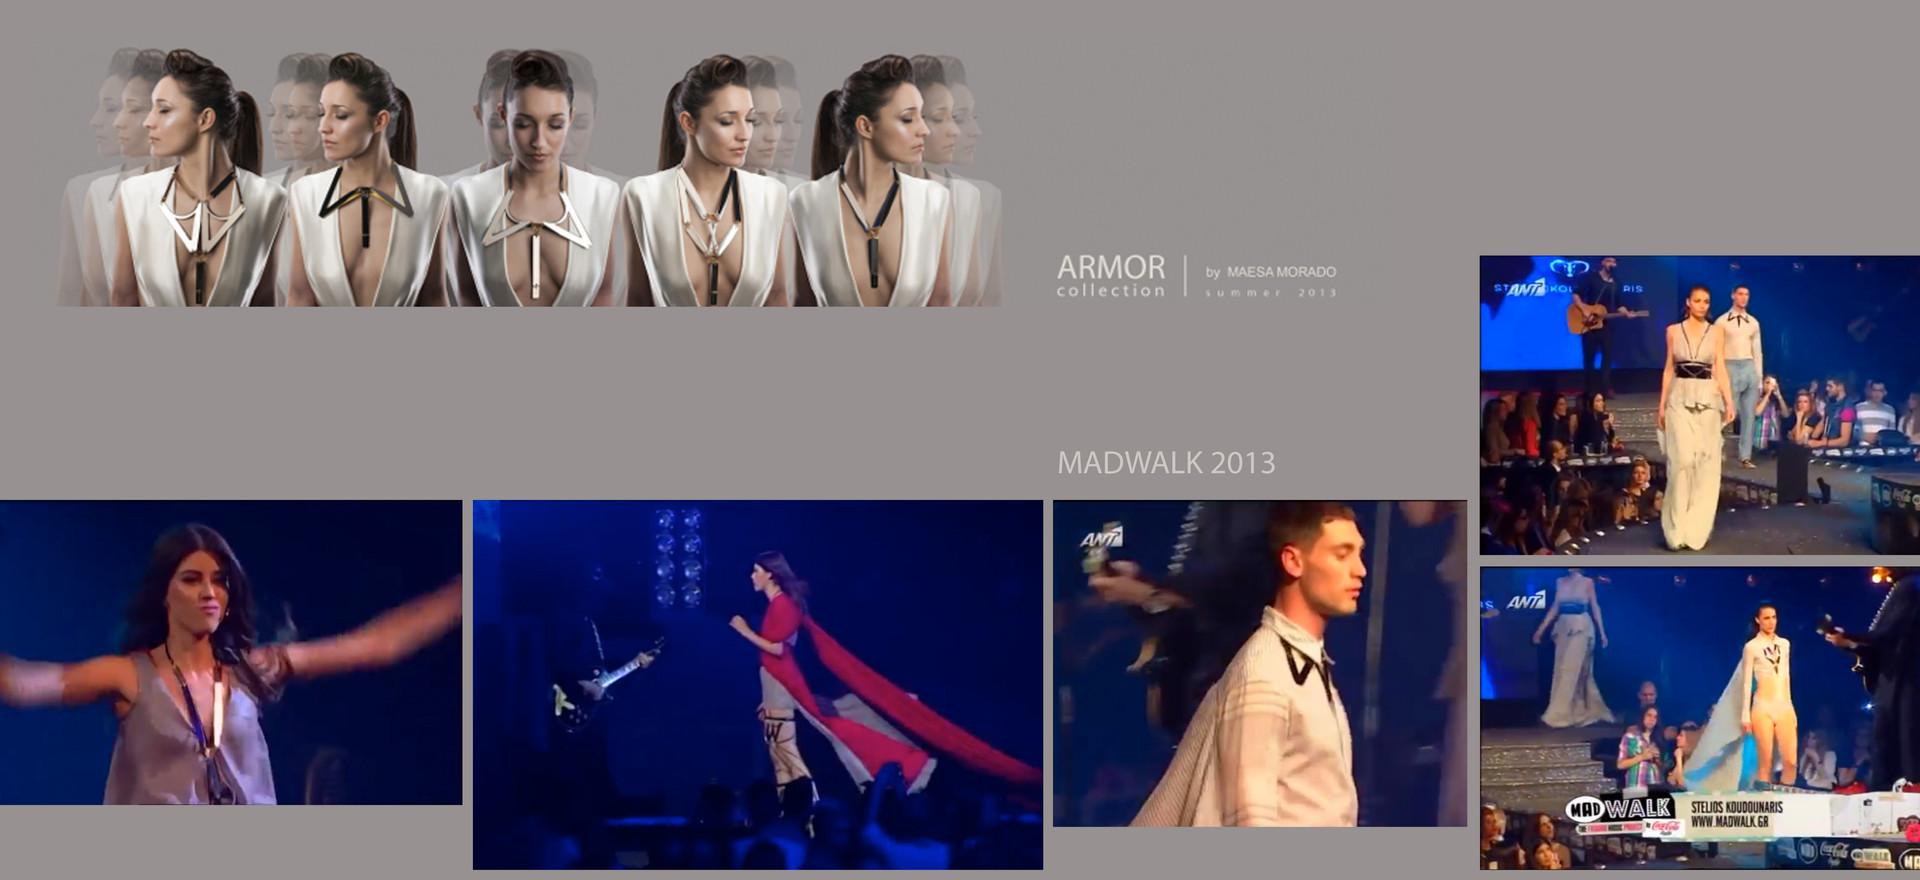 MADWALK 2013